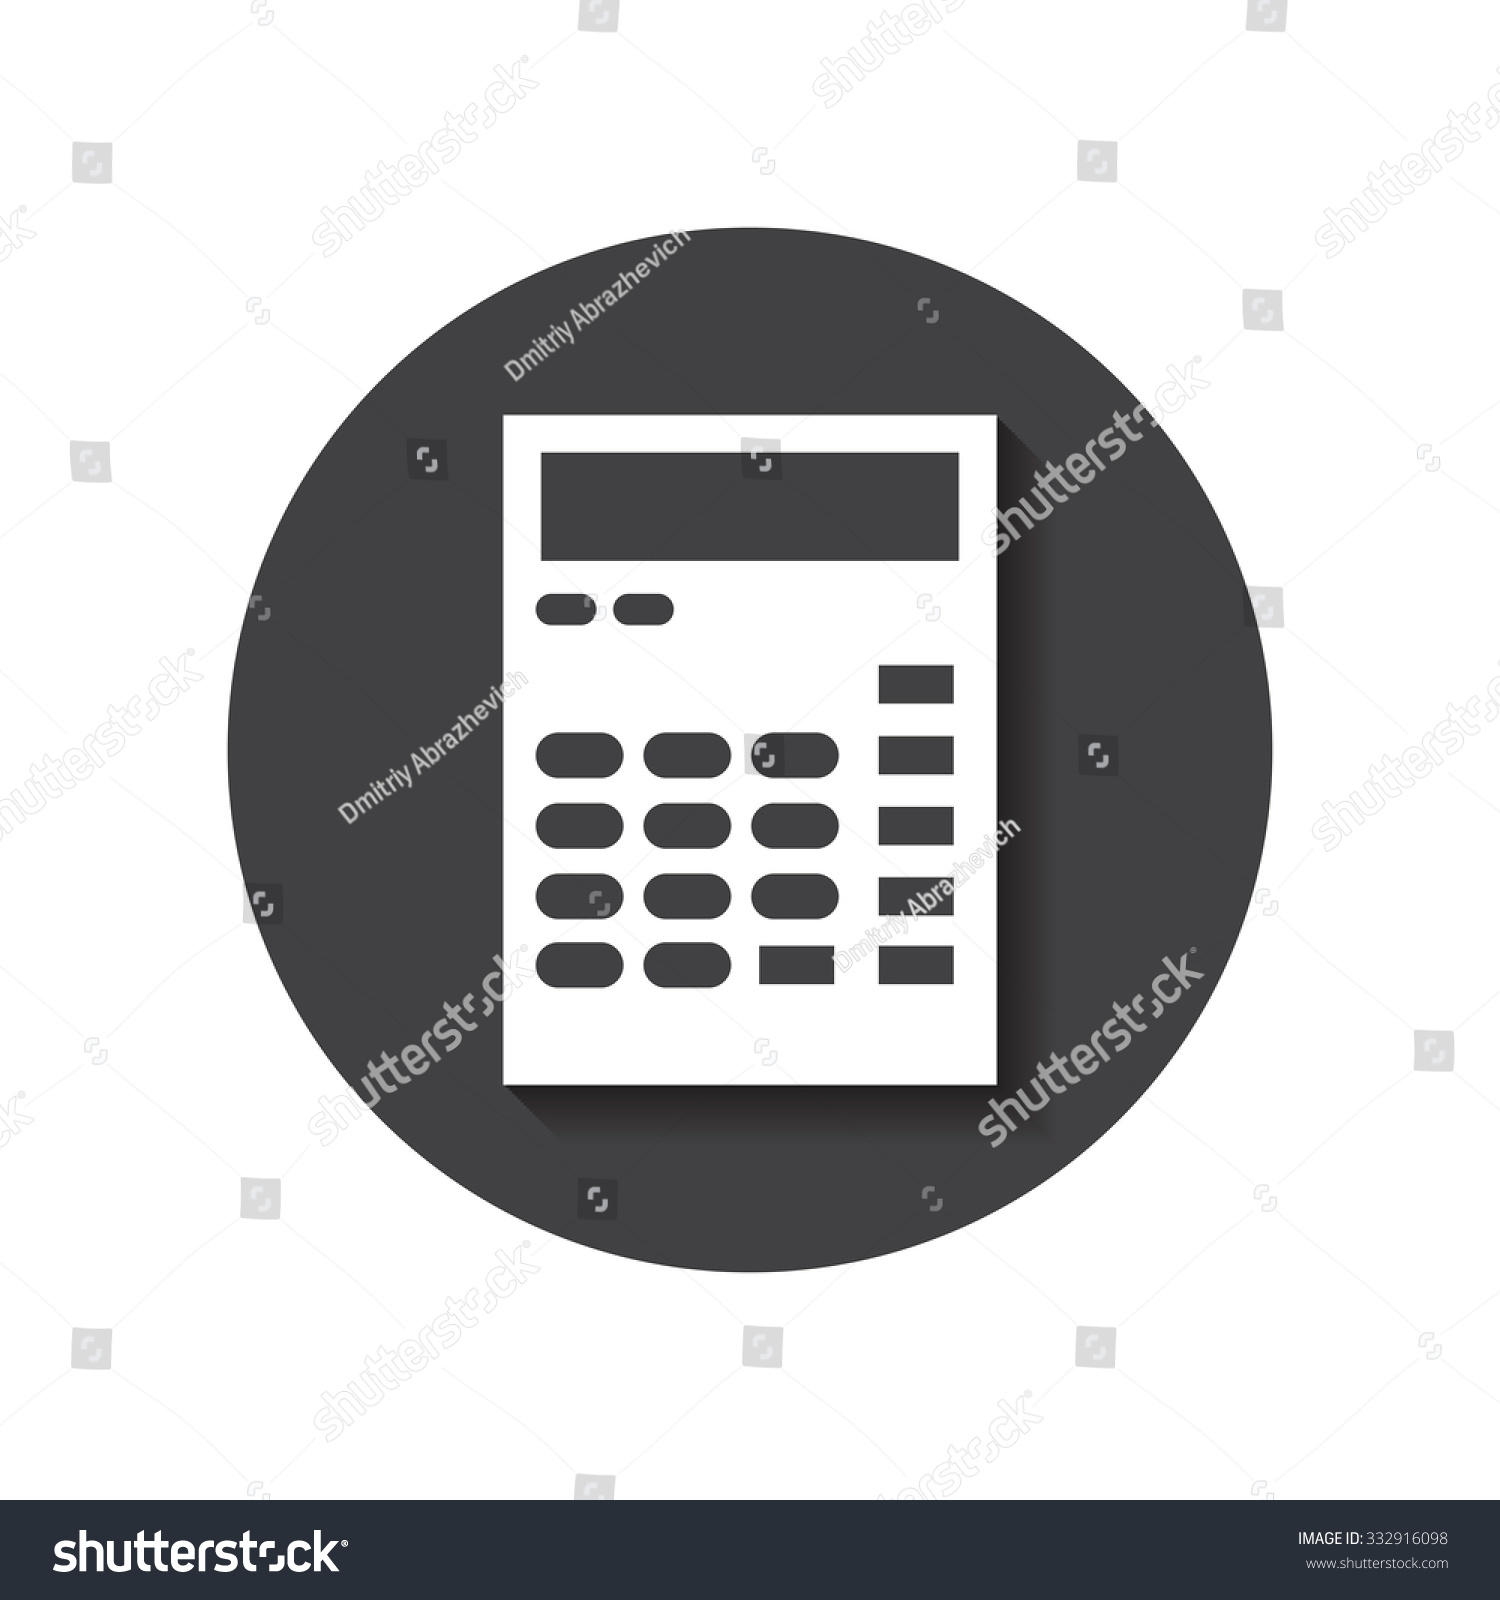 Flat Designed Round Calculator Icon Business Stock Illustration Logic Diagram Concept Idea